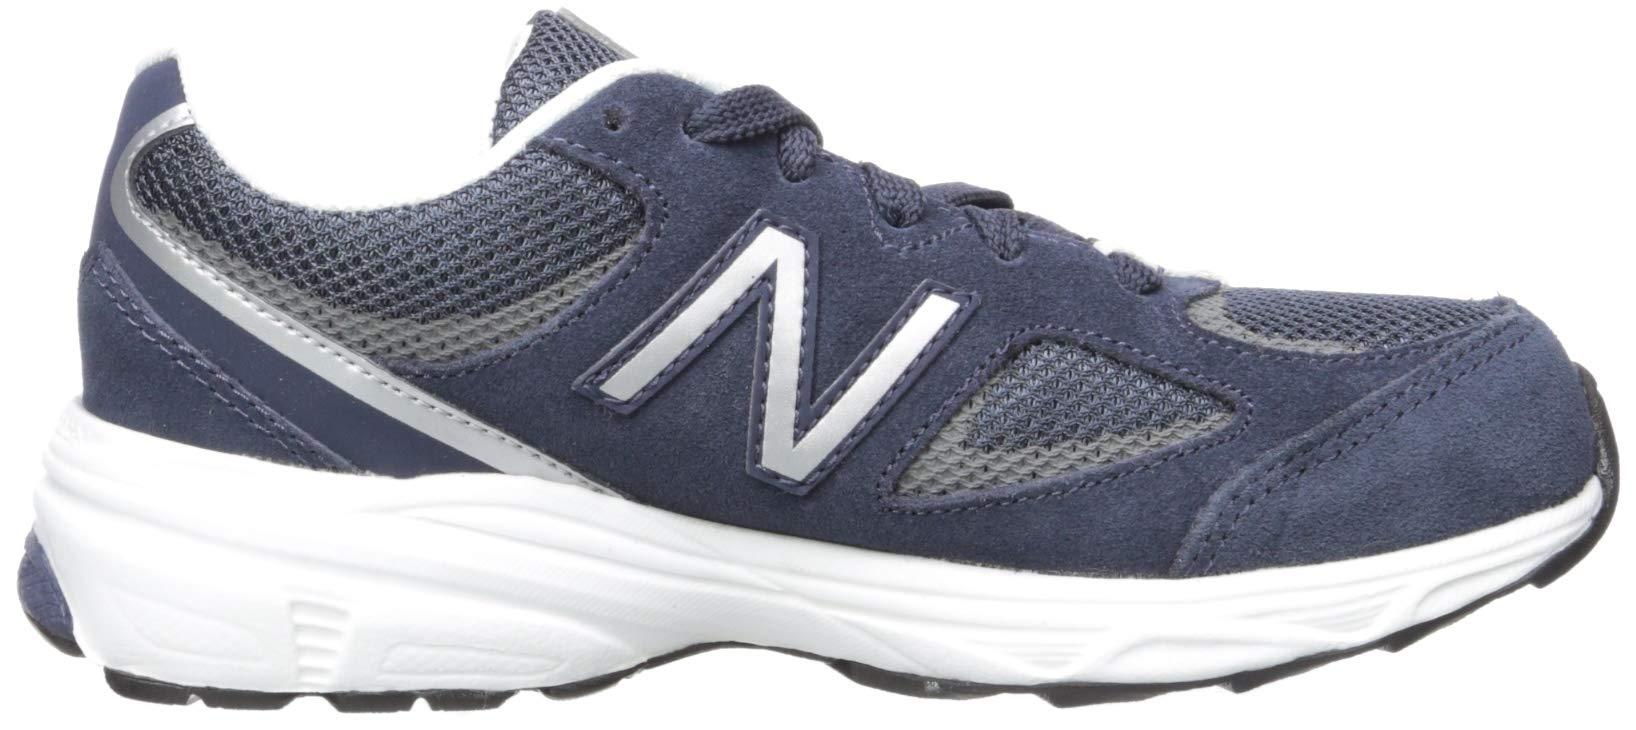 New Balance Boys' 888v2 Running Shoe, Navy/Grey, 2.5 M US Little Kid by New Balance (Image #7)